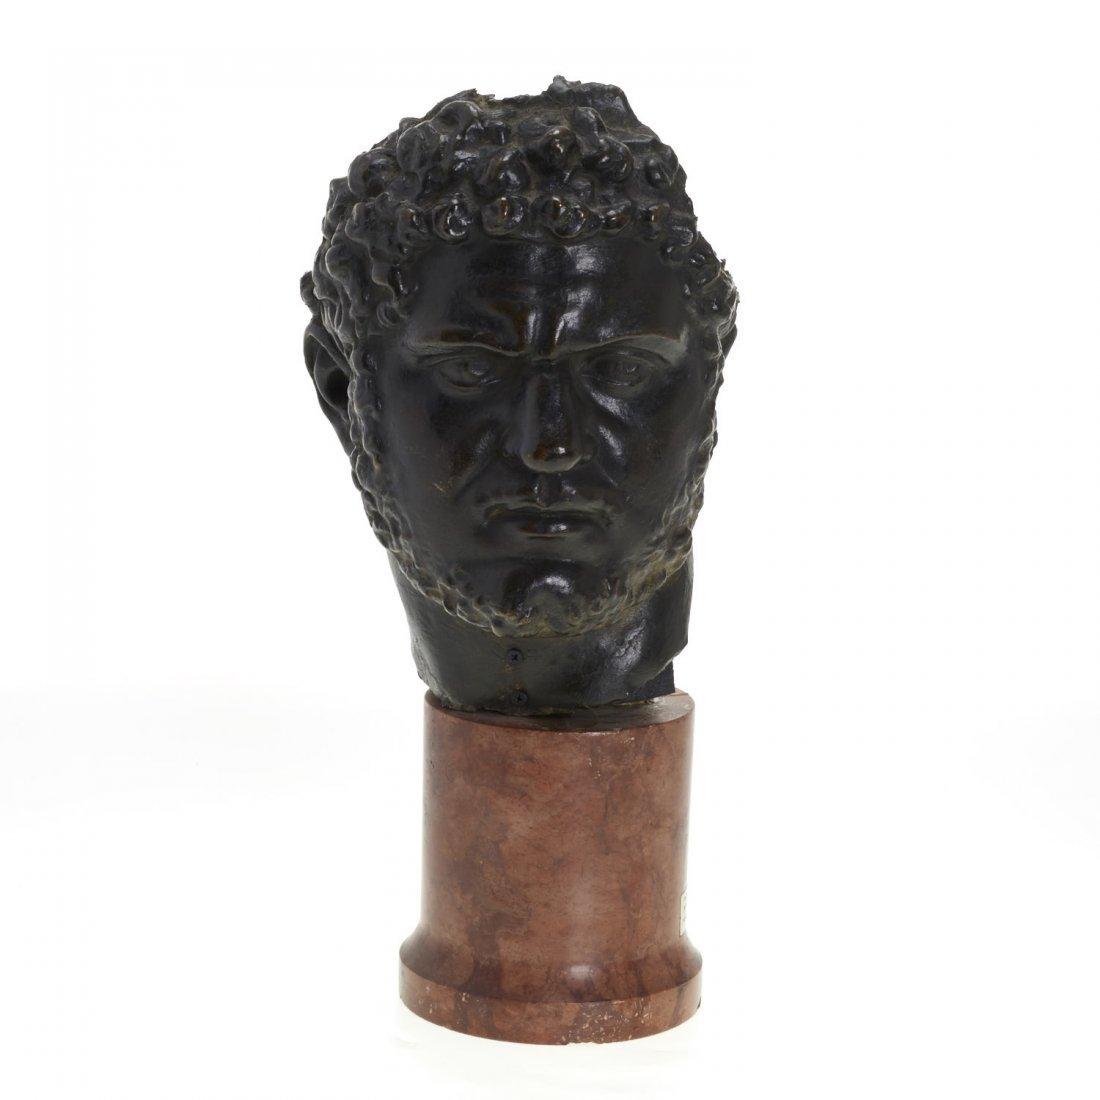 Italian School, patinated bronze bust